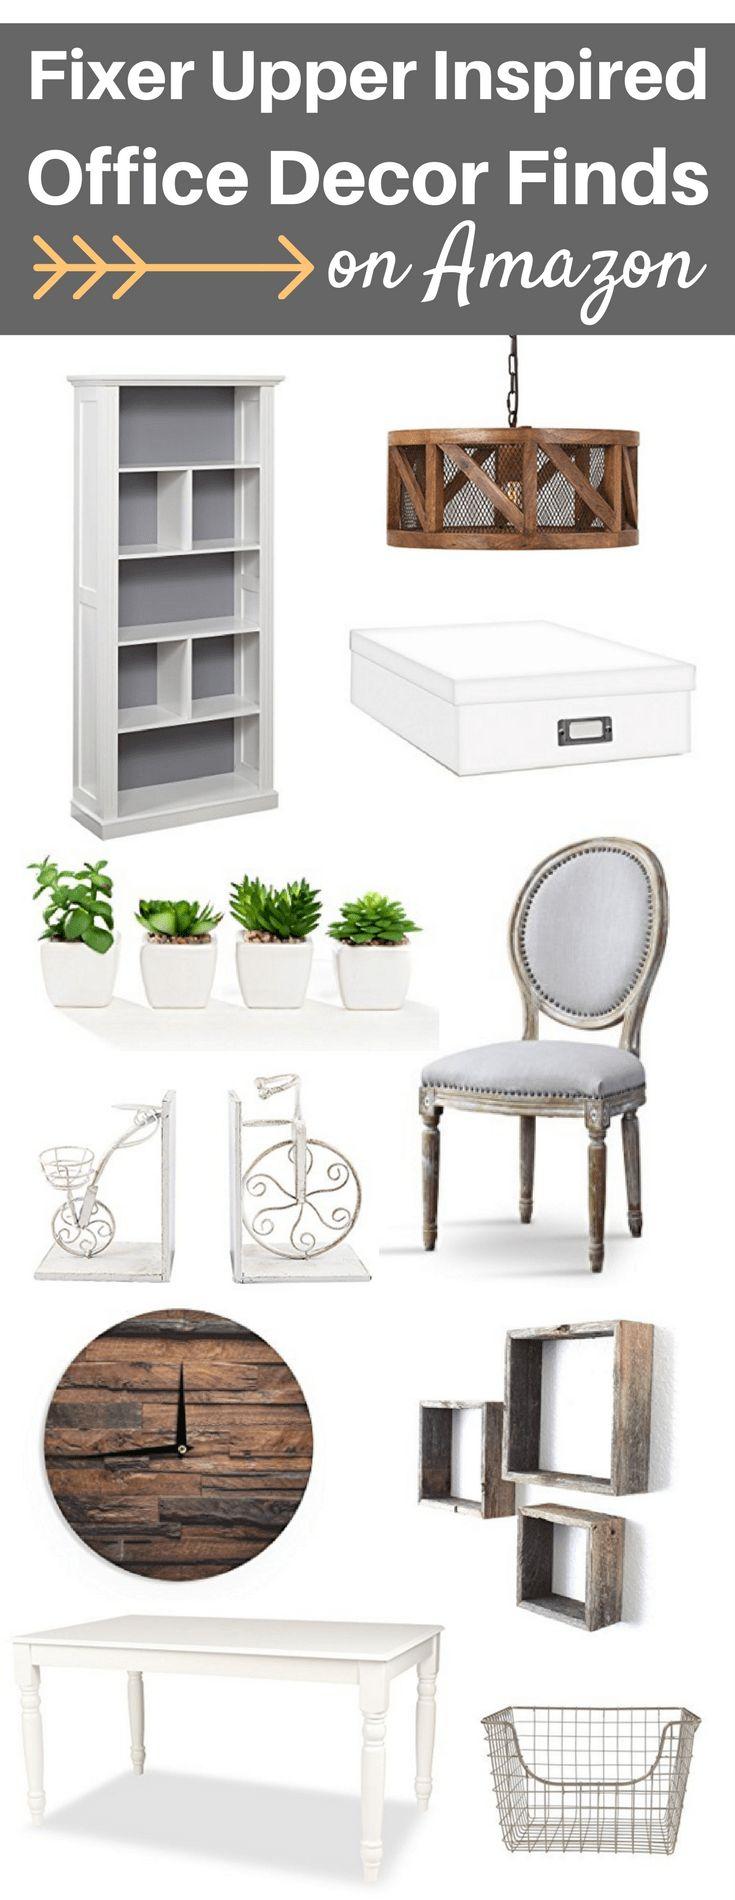 A Brick Home: Office decor ideas, fixer upper style, home office, rustic office decorating ideas